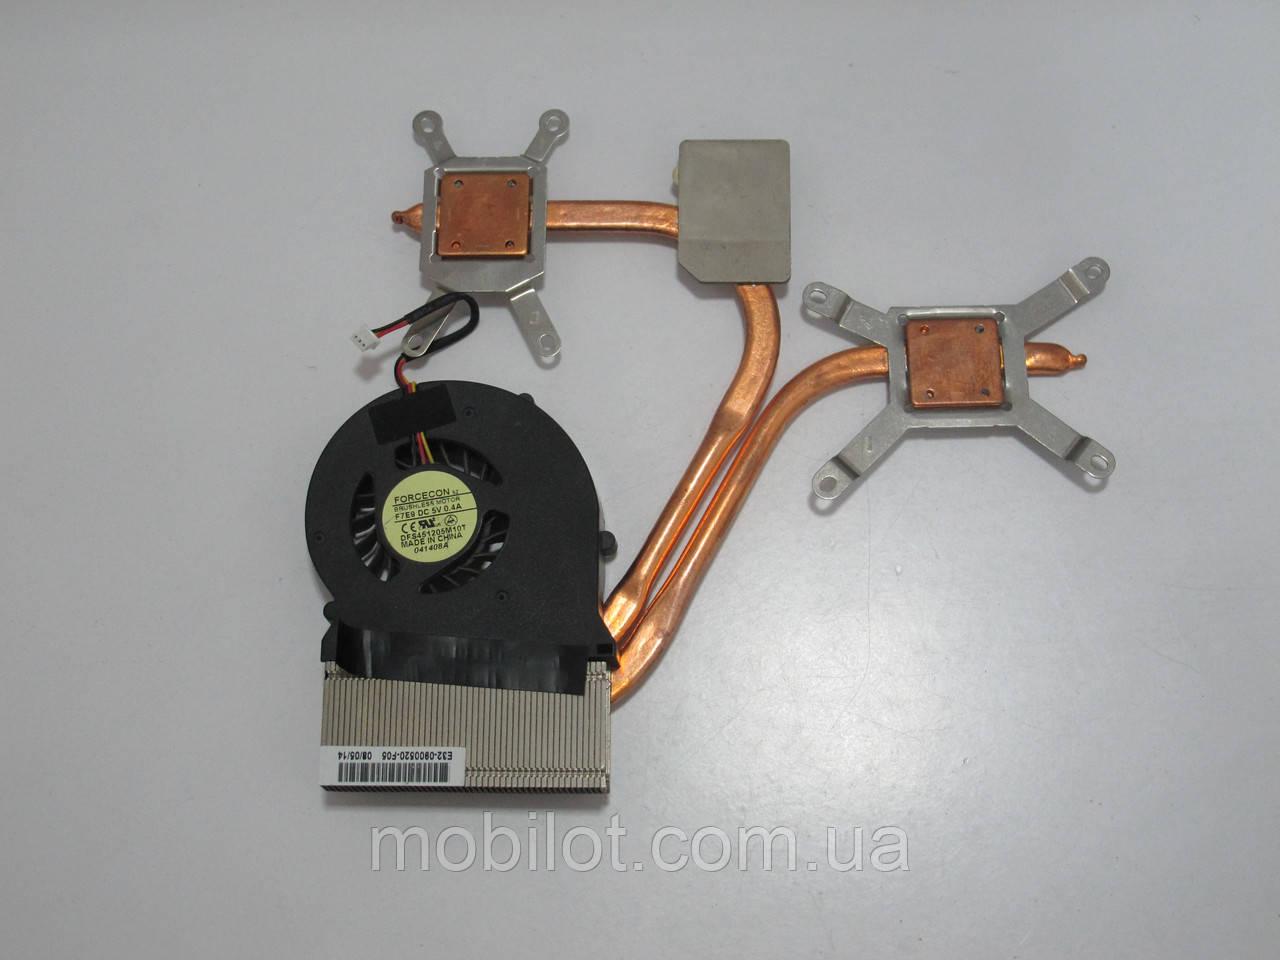 Система охлаждения LG E50 (NZ-3871)